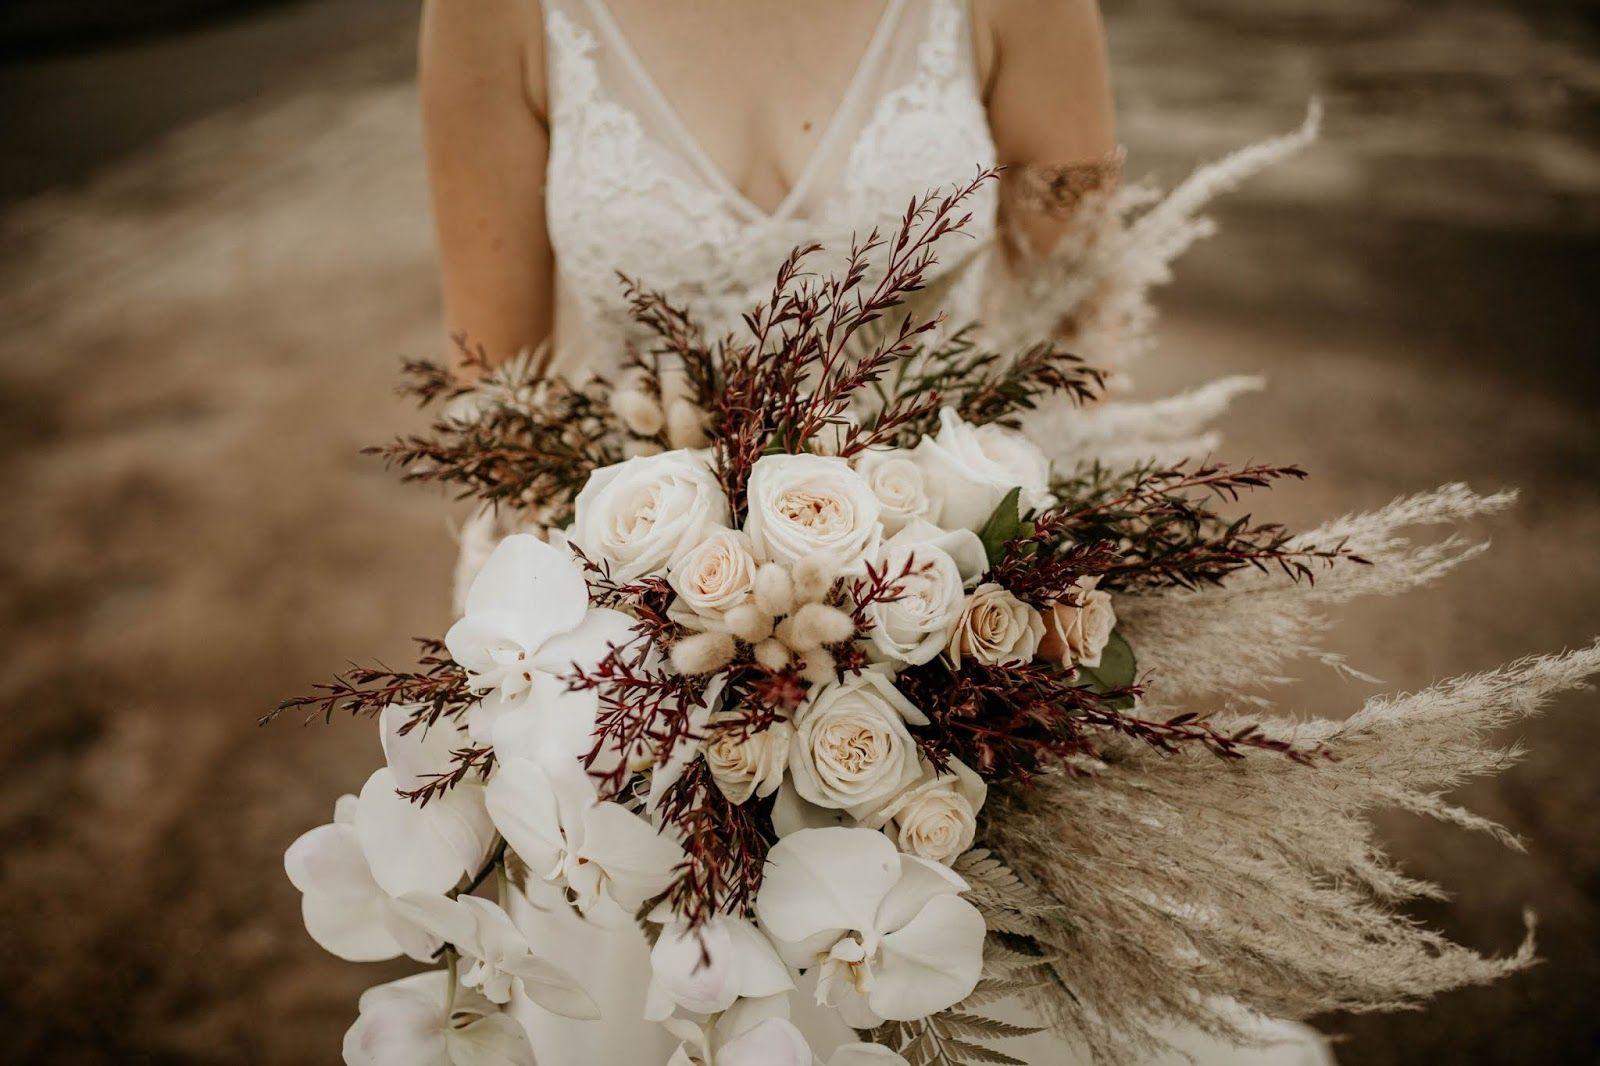 Luxe Boho Bridal Inspiration Townsville Flower Bouquet Wedding Bridal Inspiration Boho Bridal